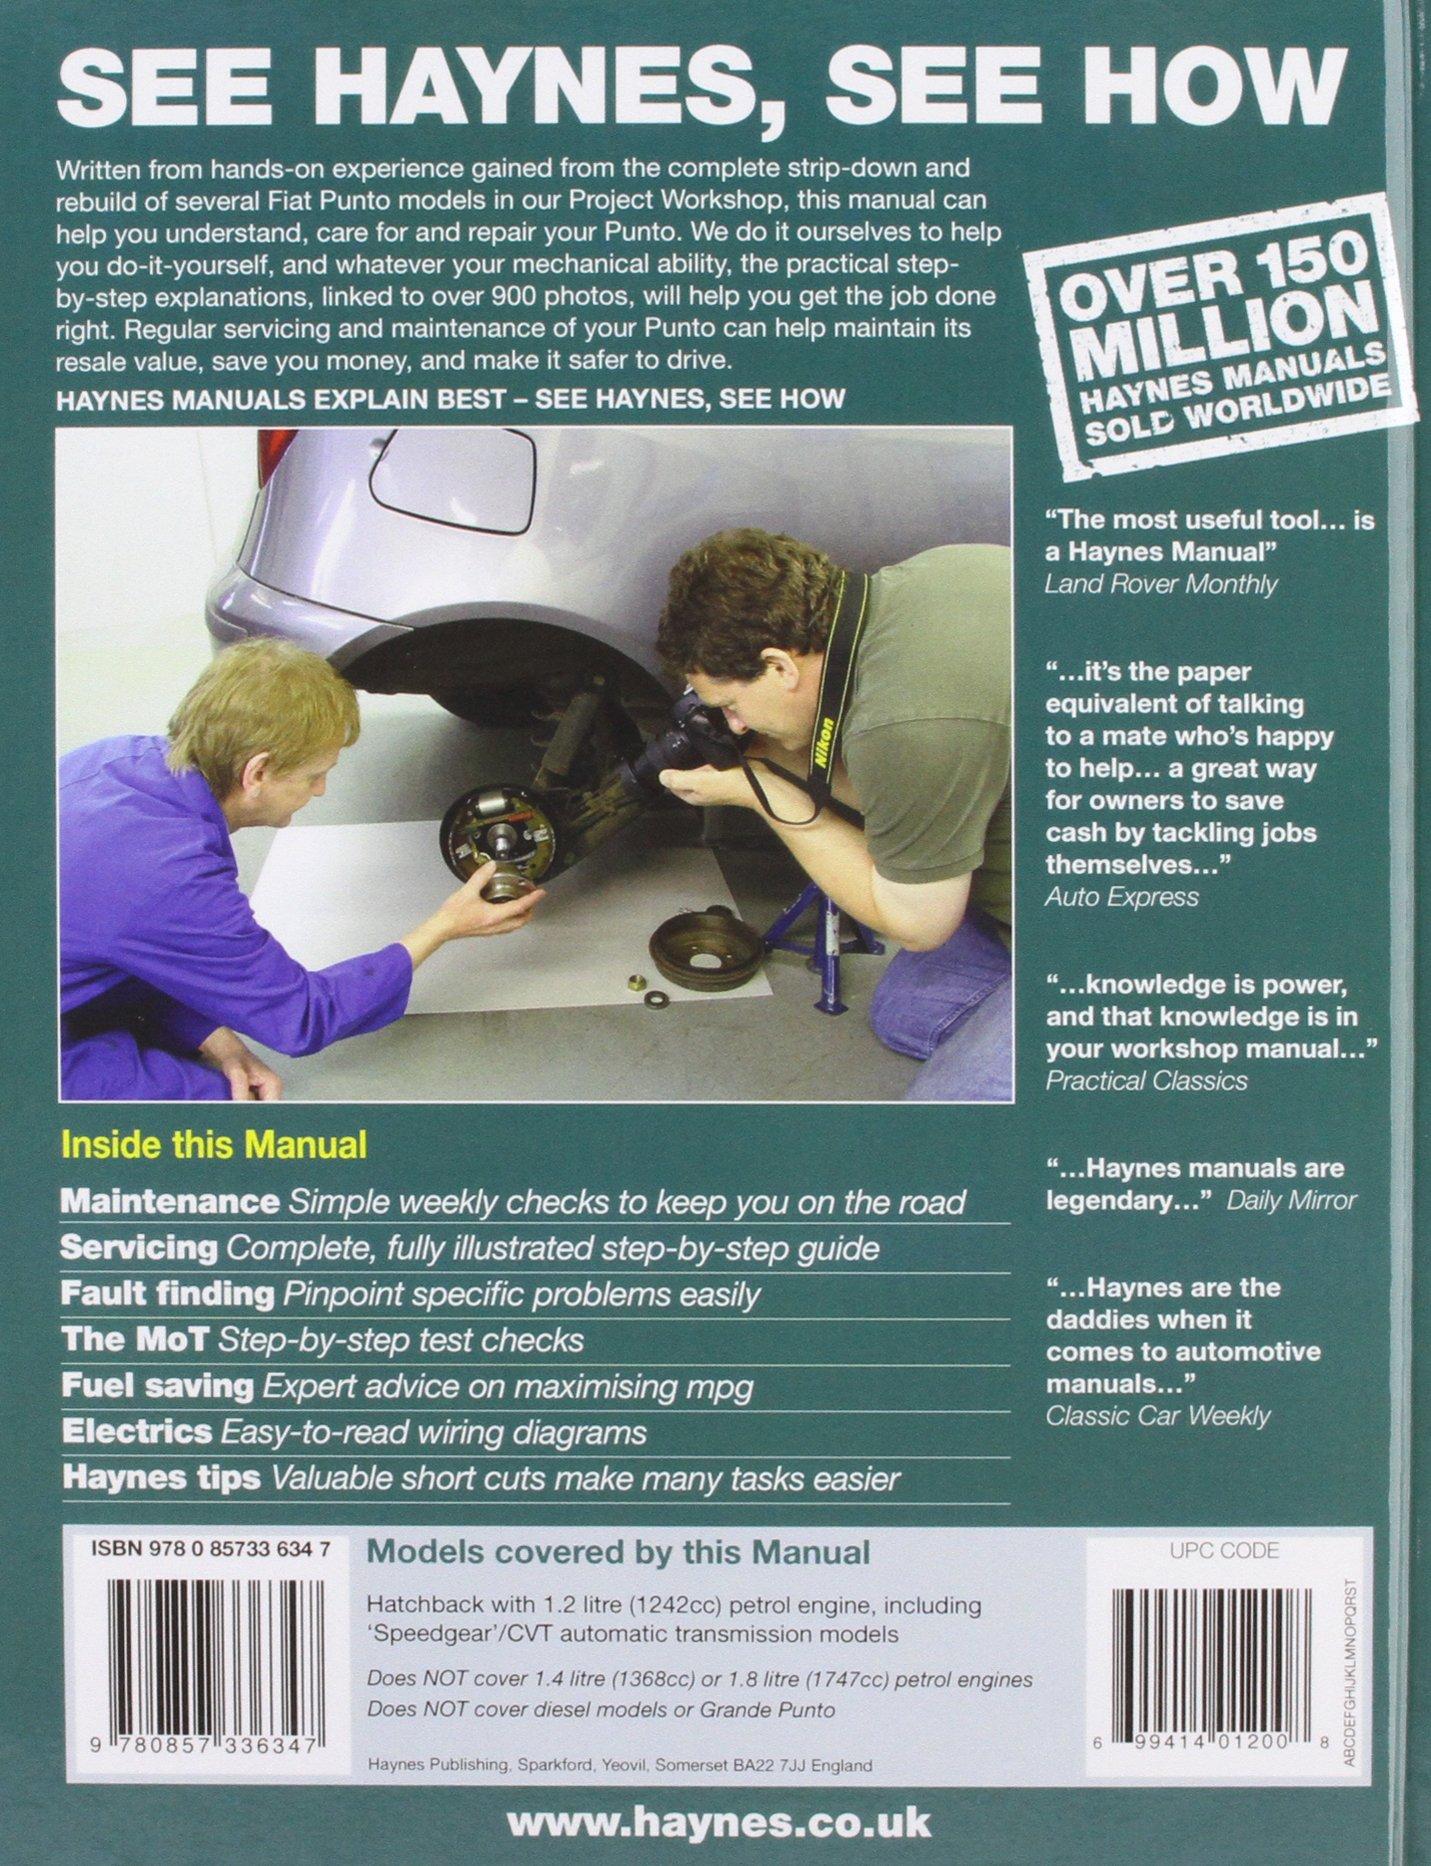 Fiat Punto petrol (Oct 99 - 07) Haynes Repair Manual (Haynes Service and Repair  Manuals): Amazon.co.uk: Anon: 9780857336347: Books